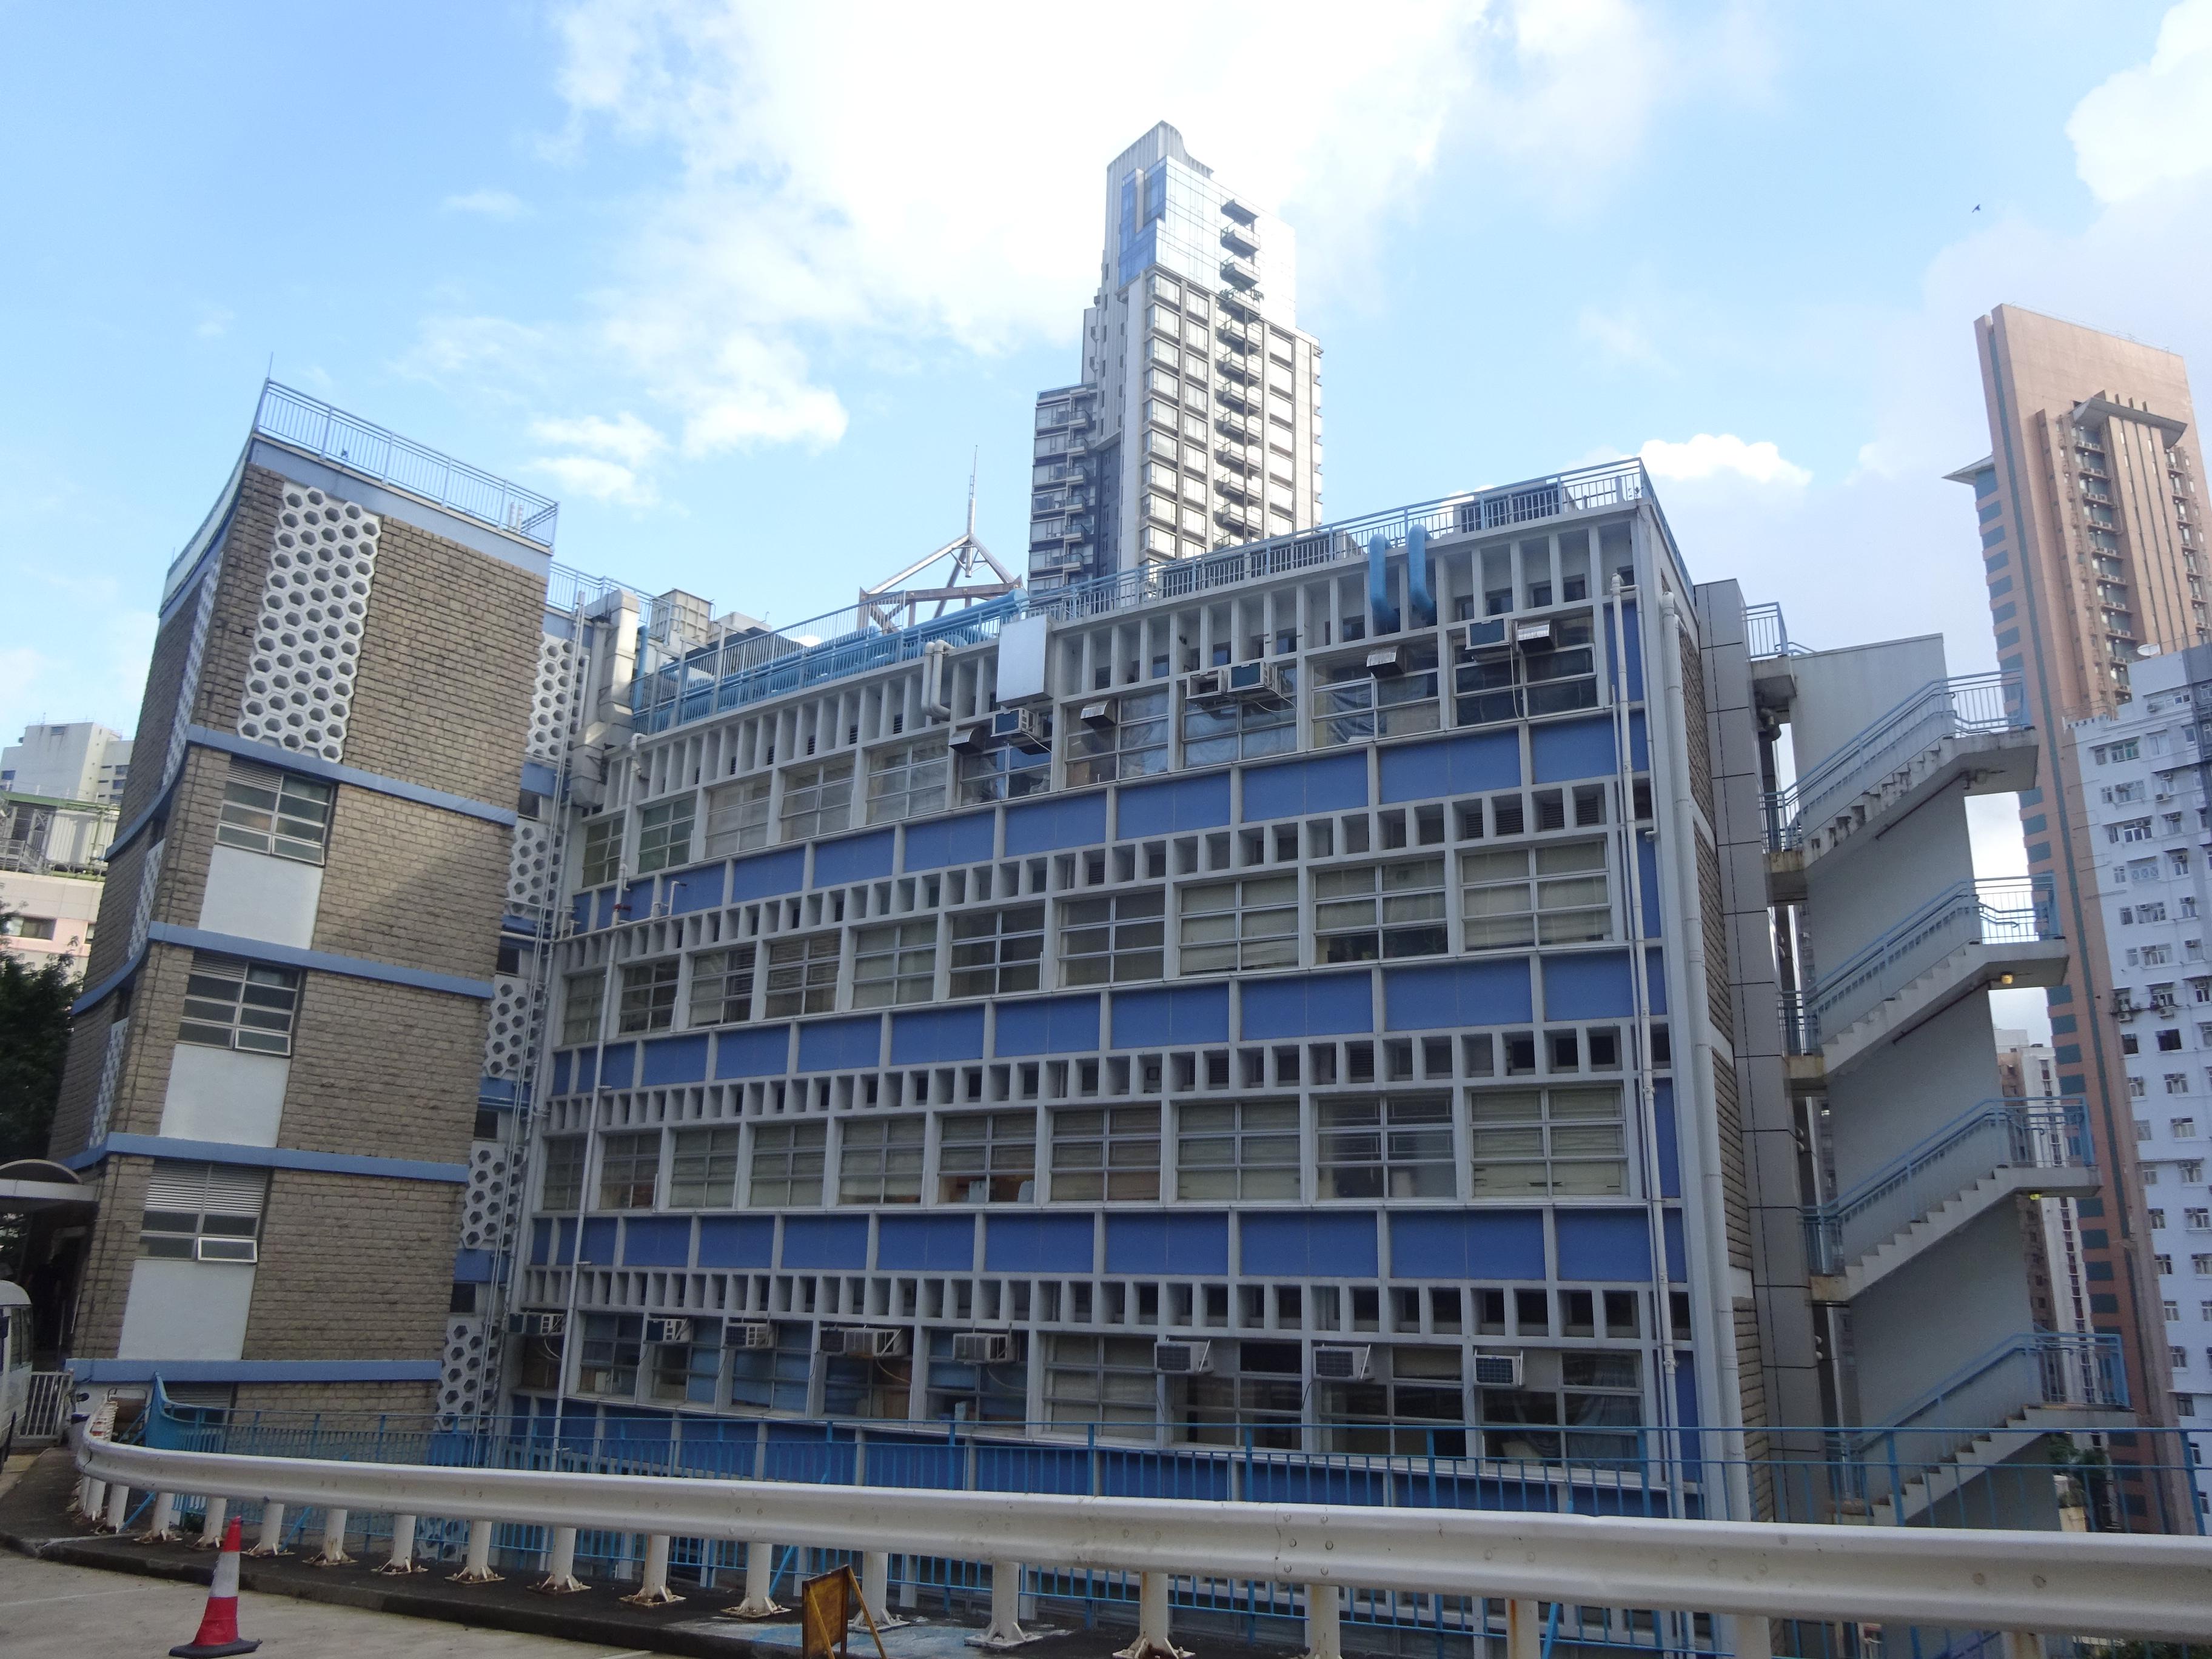 File:HK Sheung Wan 醫院道 Hospital Road 西營盤賽馬會分科診所 Sai Ying Pun Jockey Club Polyclinic Aug 2016 DSC.jpg - Wikimedia Commons